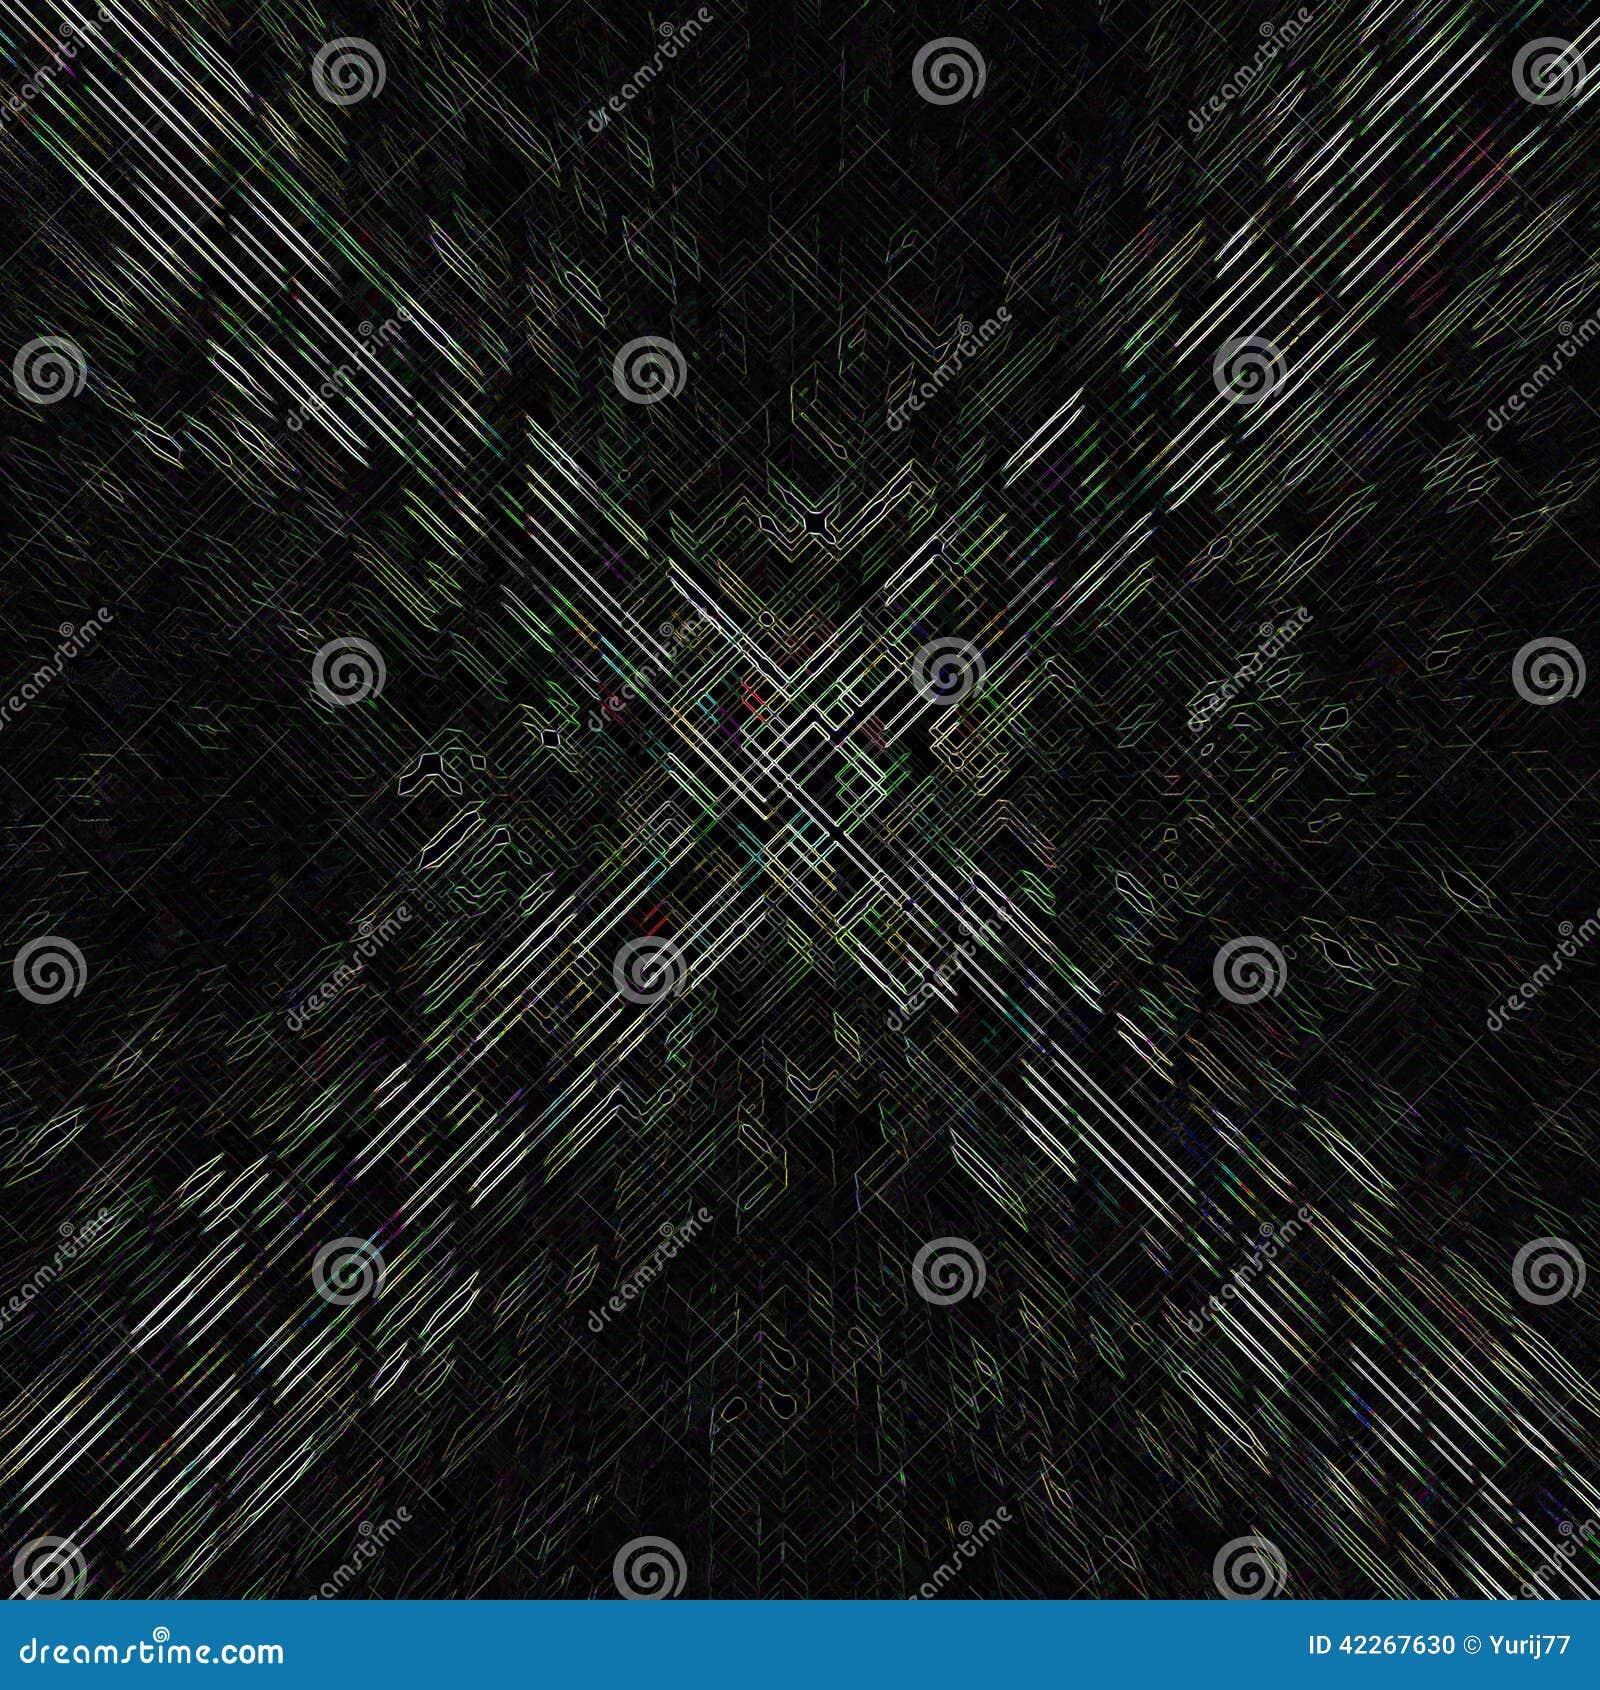 Line Texture Black And White : Black background stock illustration image